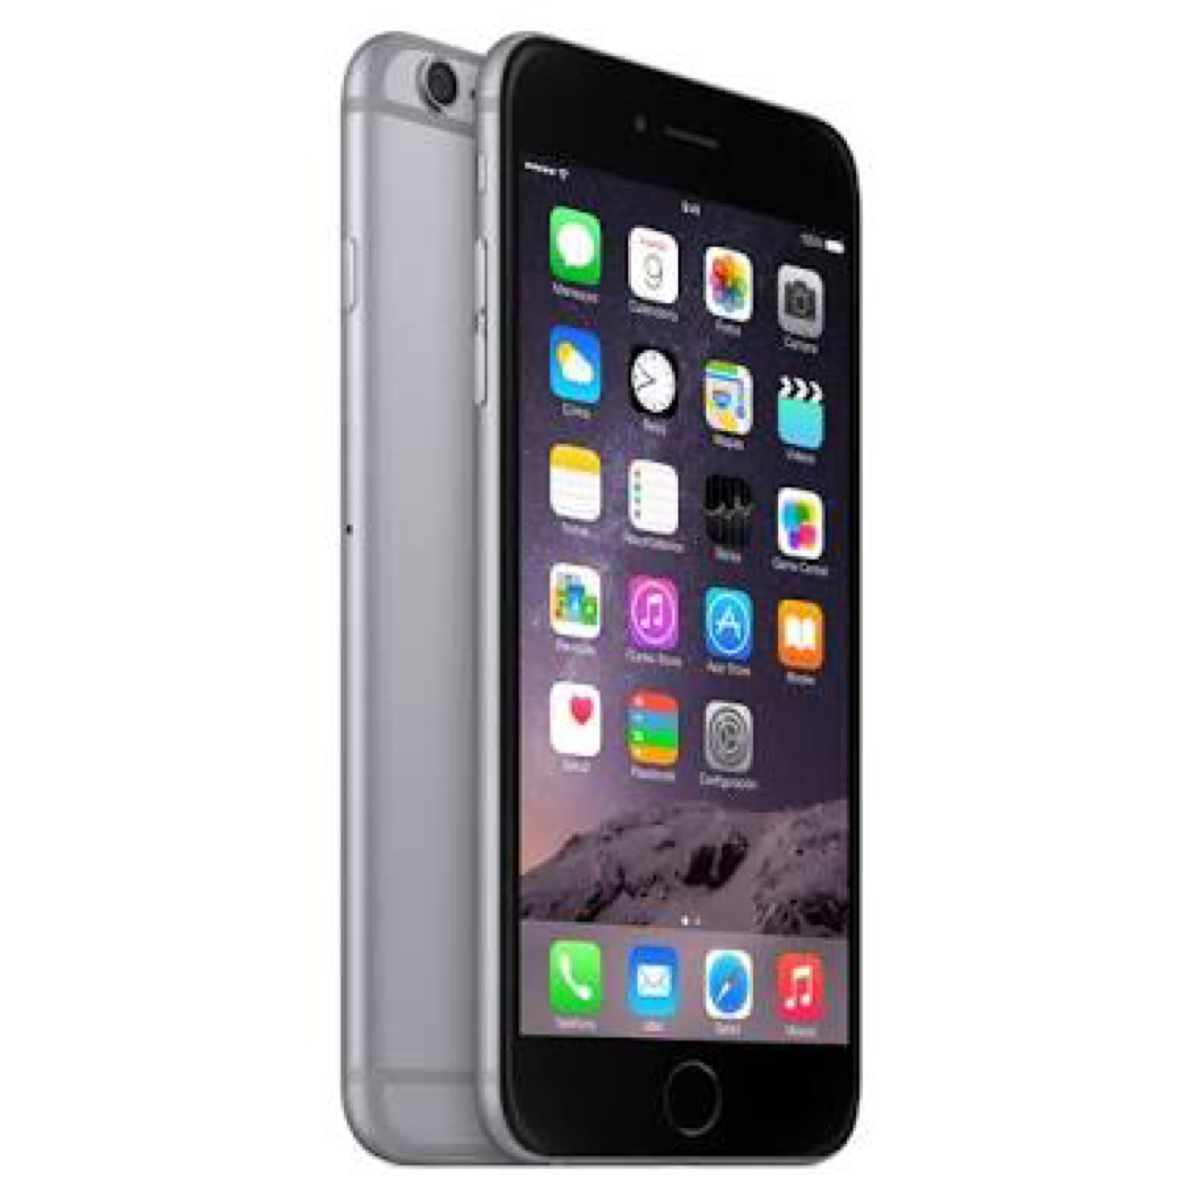 iphone 6 plus space gray 128 gb anatel r em. Black Bedroom Furniture Sets. Home Design Ideas